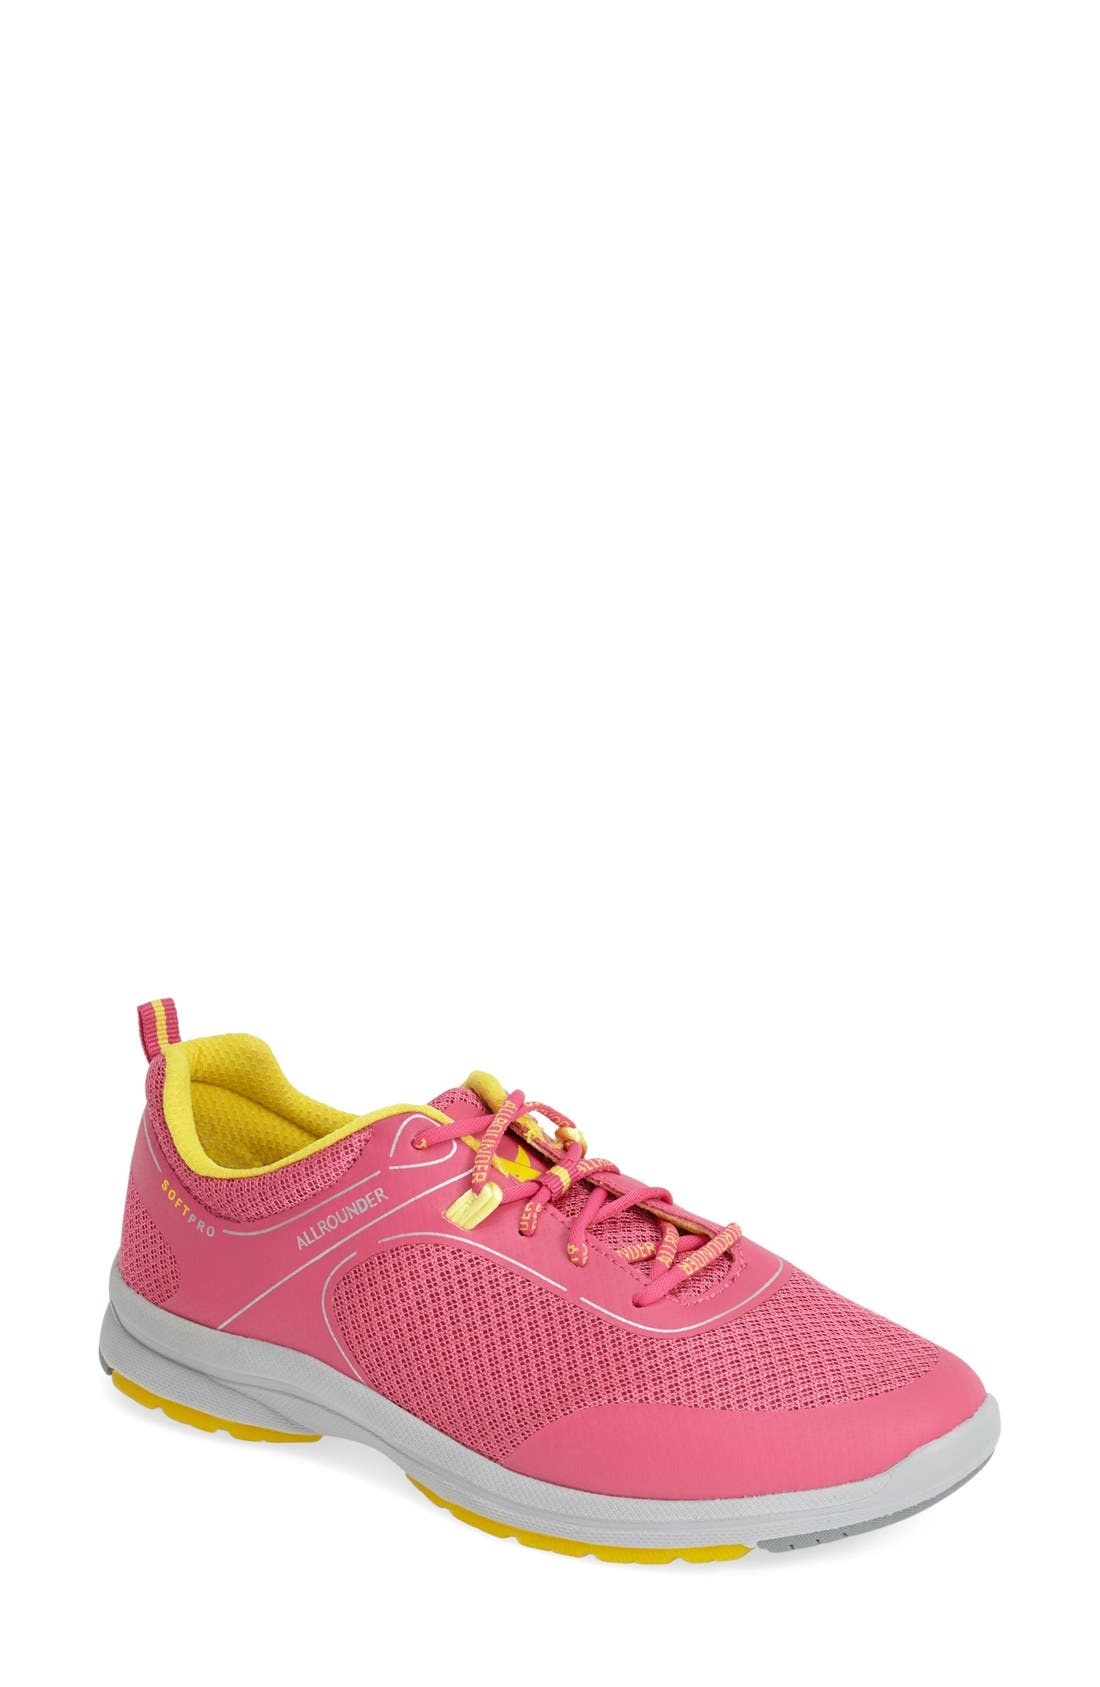 'Dakona' Sneaker,                             Main thumbnail 1, color,                             650